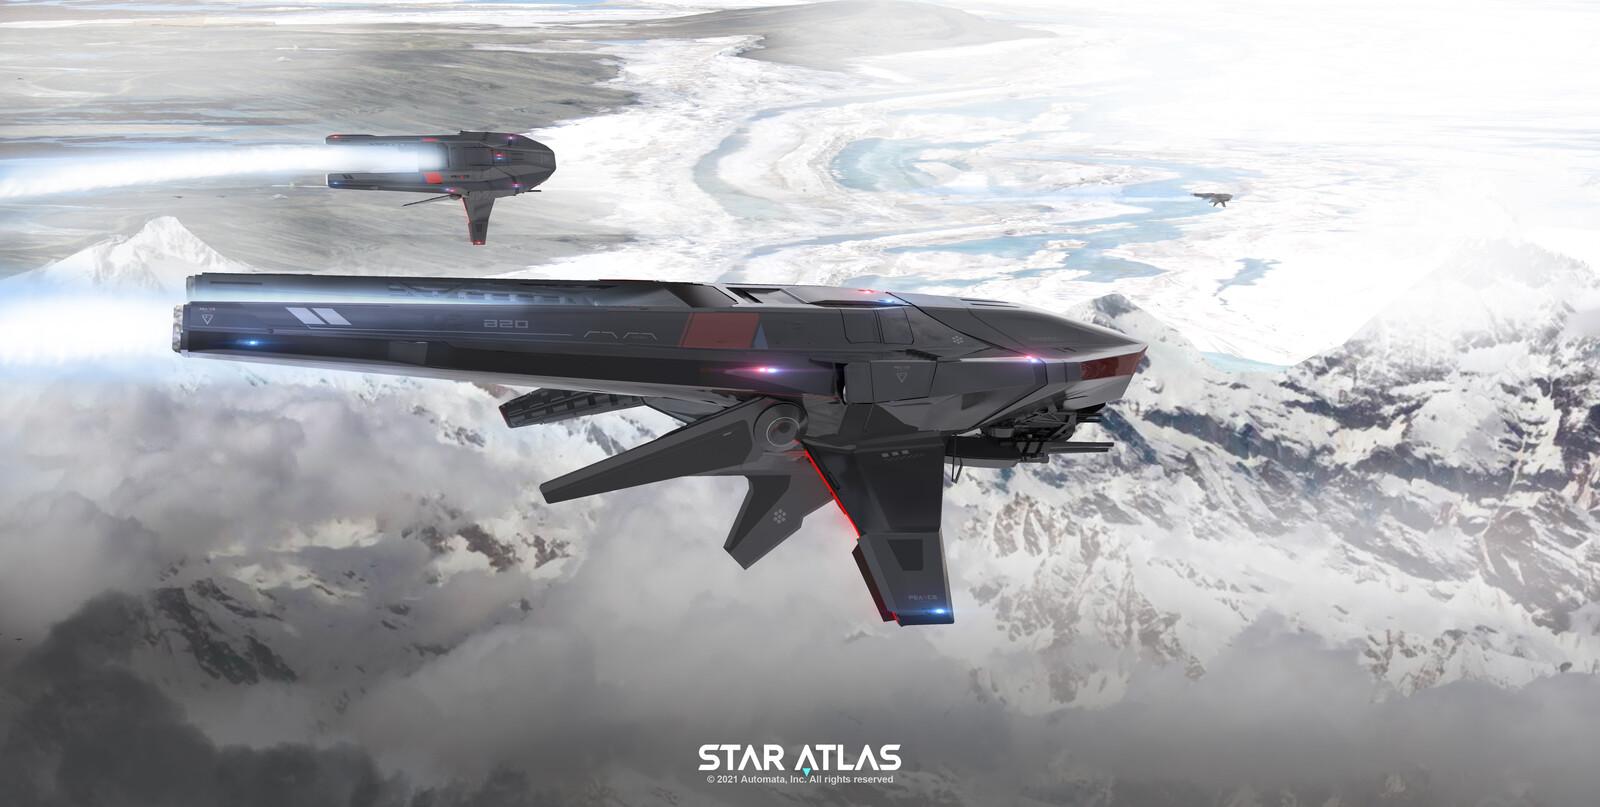 Star Atlas: Pearce F4 Fighter